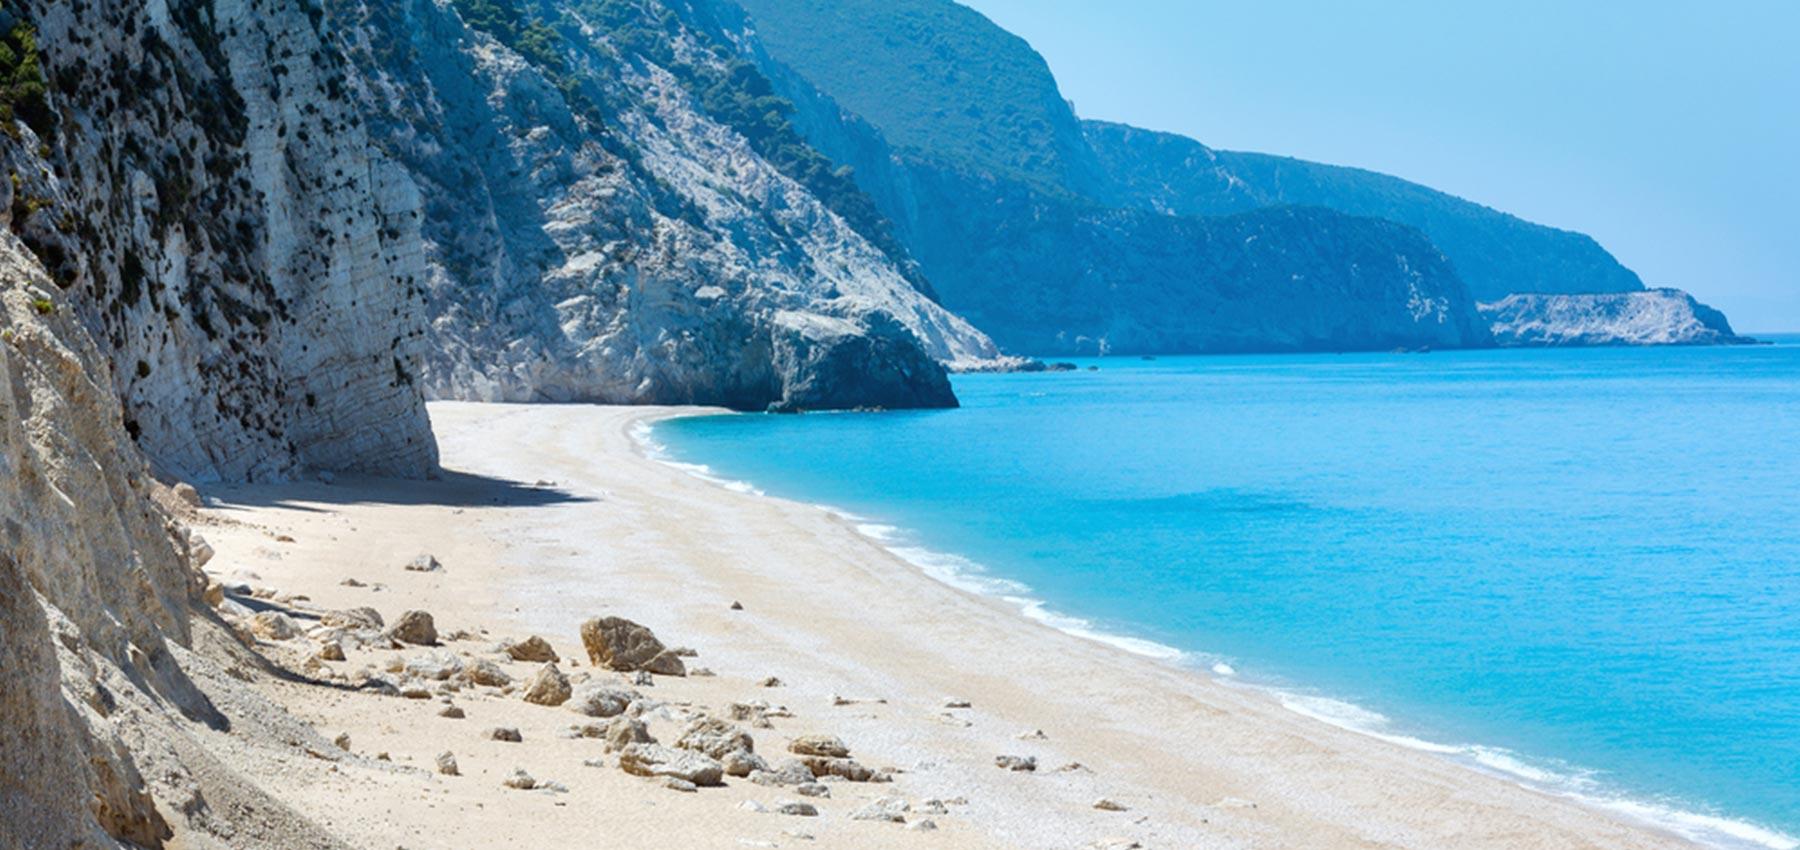 Stunning California Beach House Inspired By The Horizon: Ionian Horizon Luxurious Villas In Lefkada, Greece